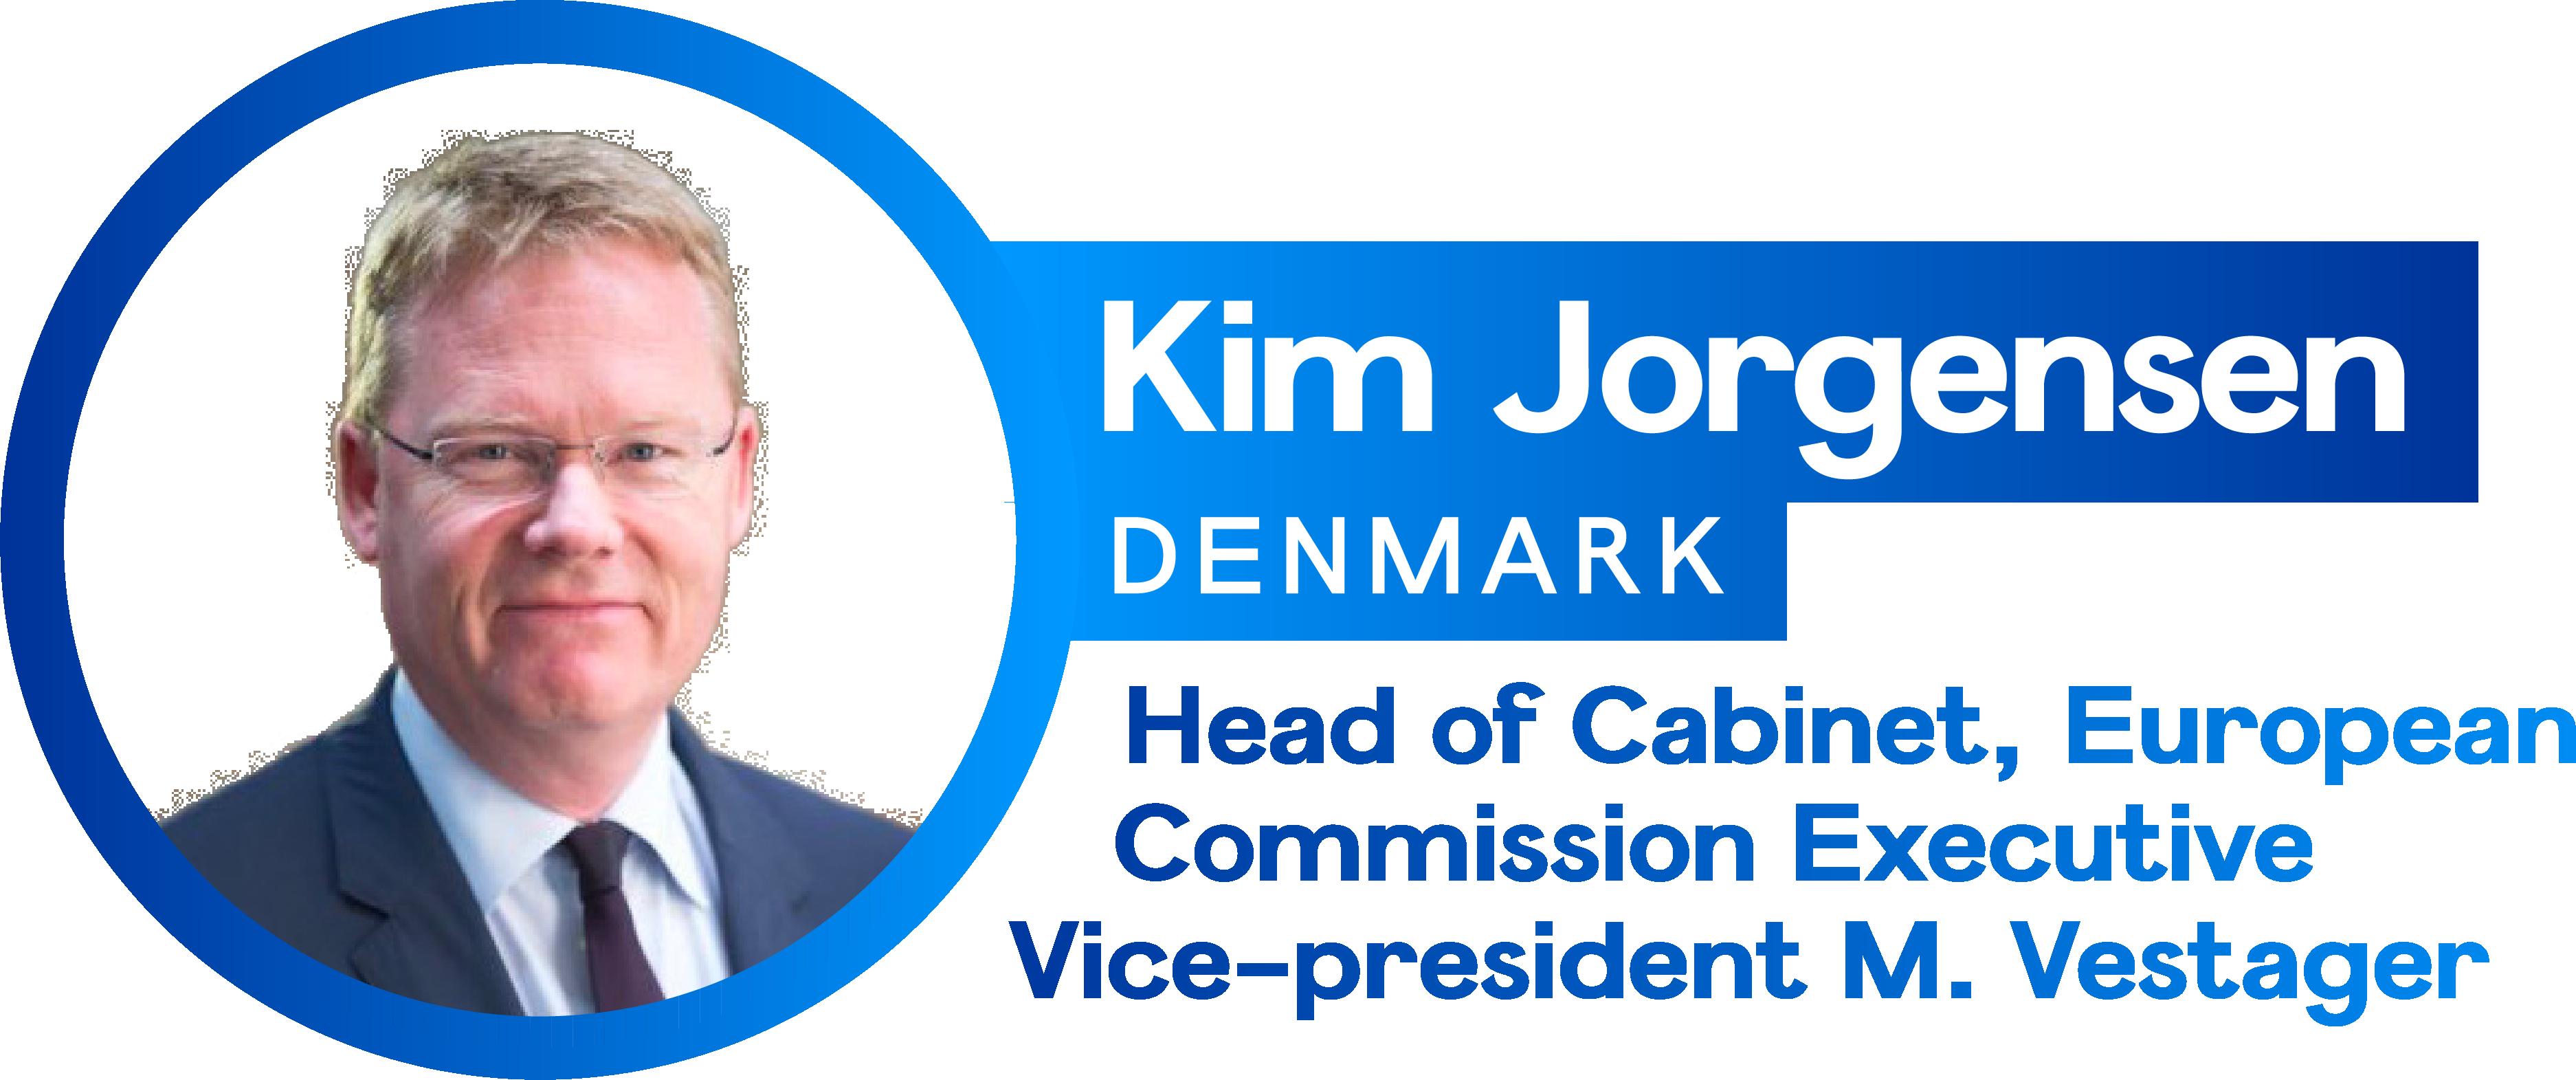 Kim Jorgensen